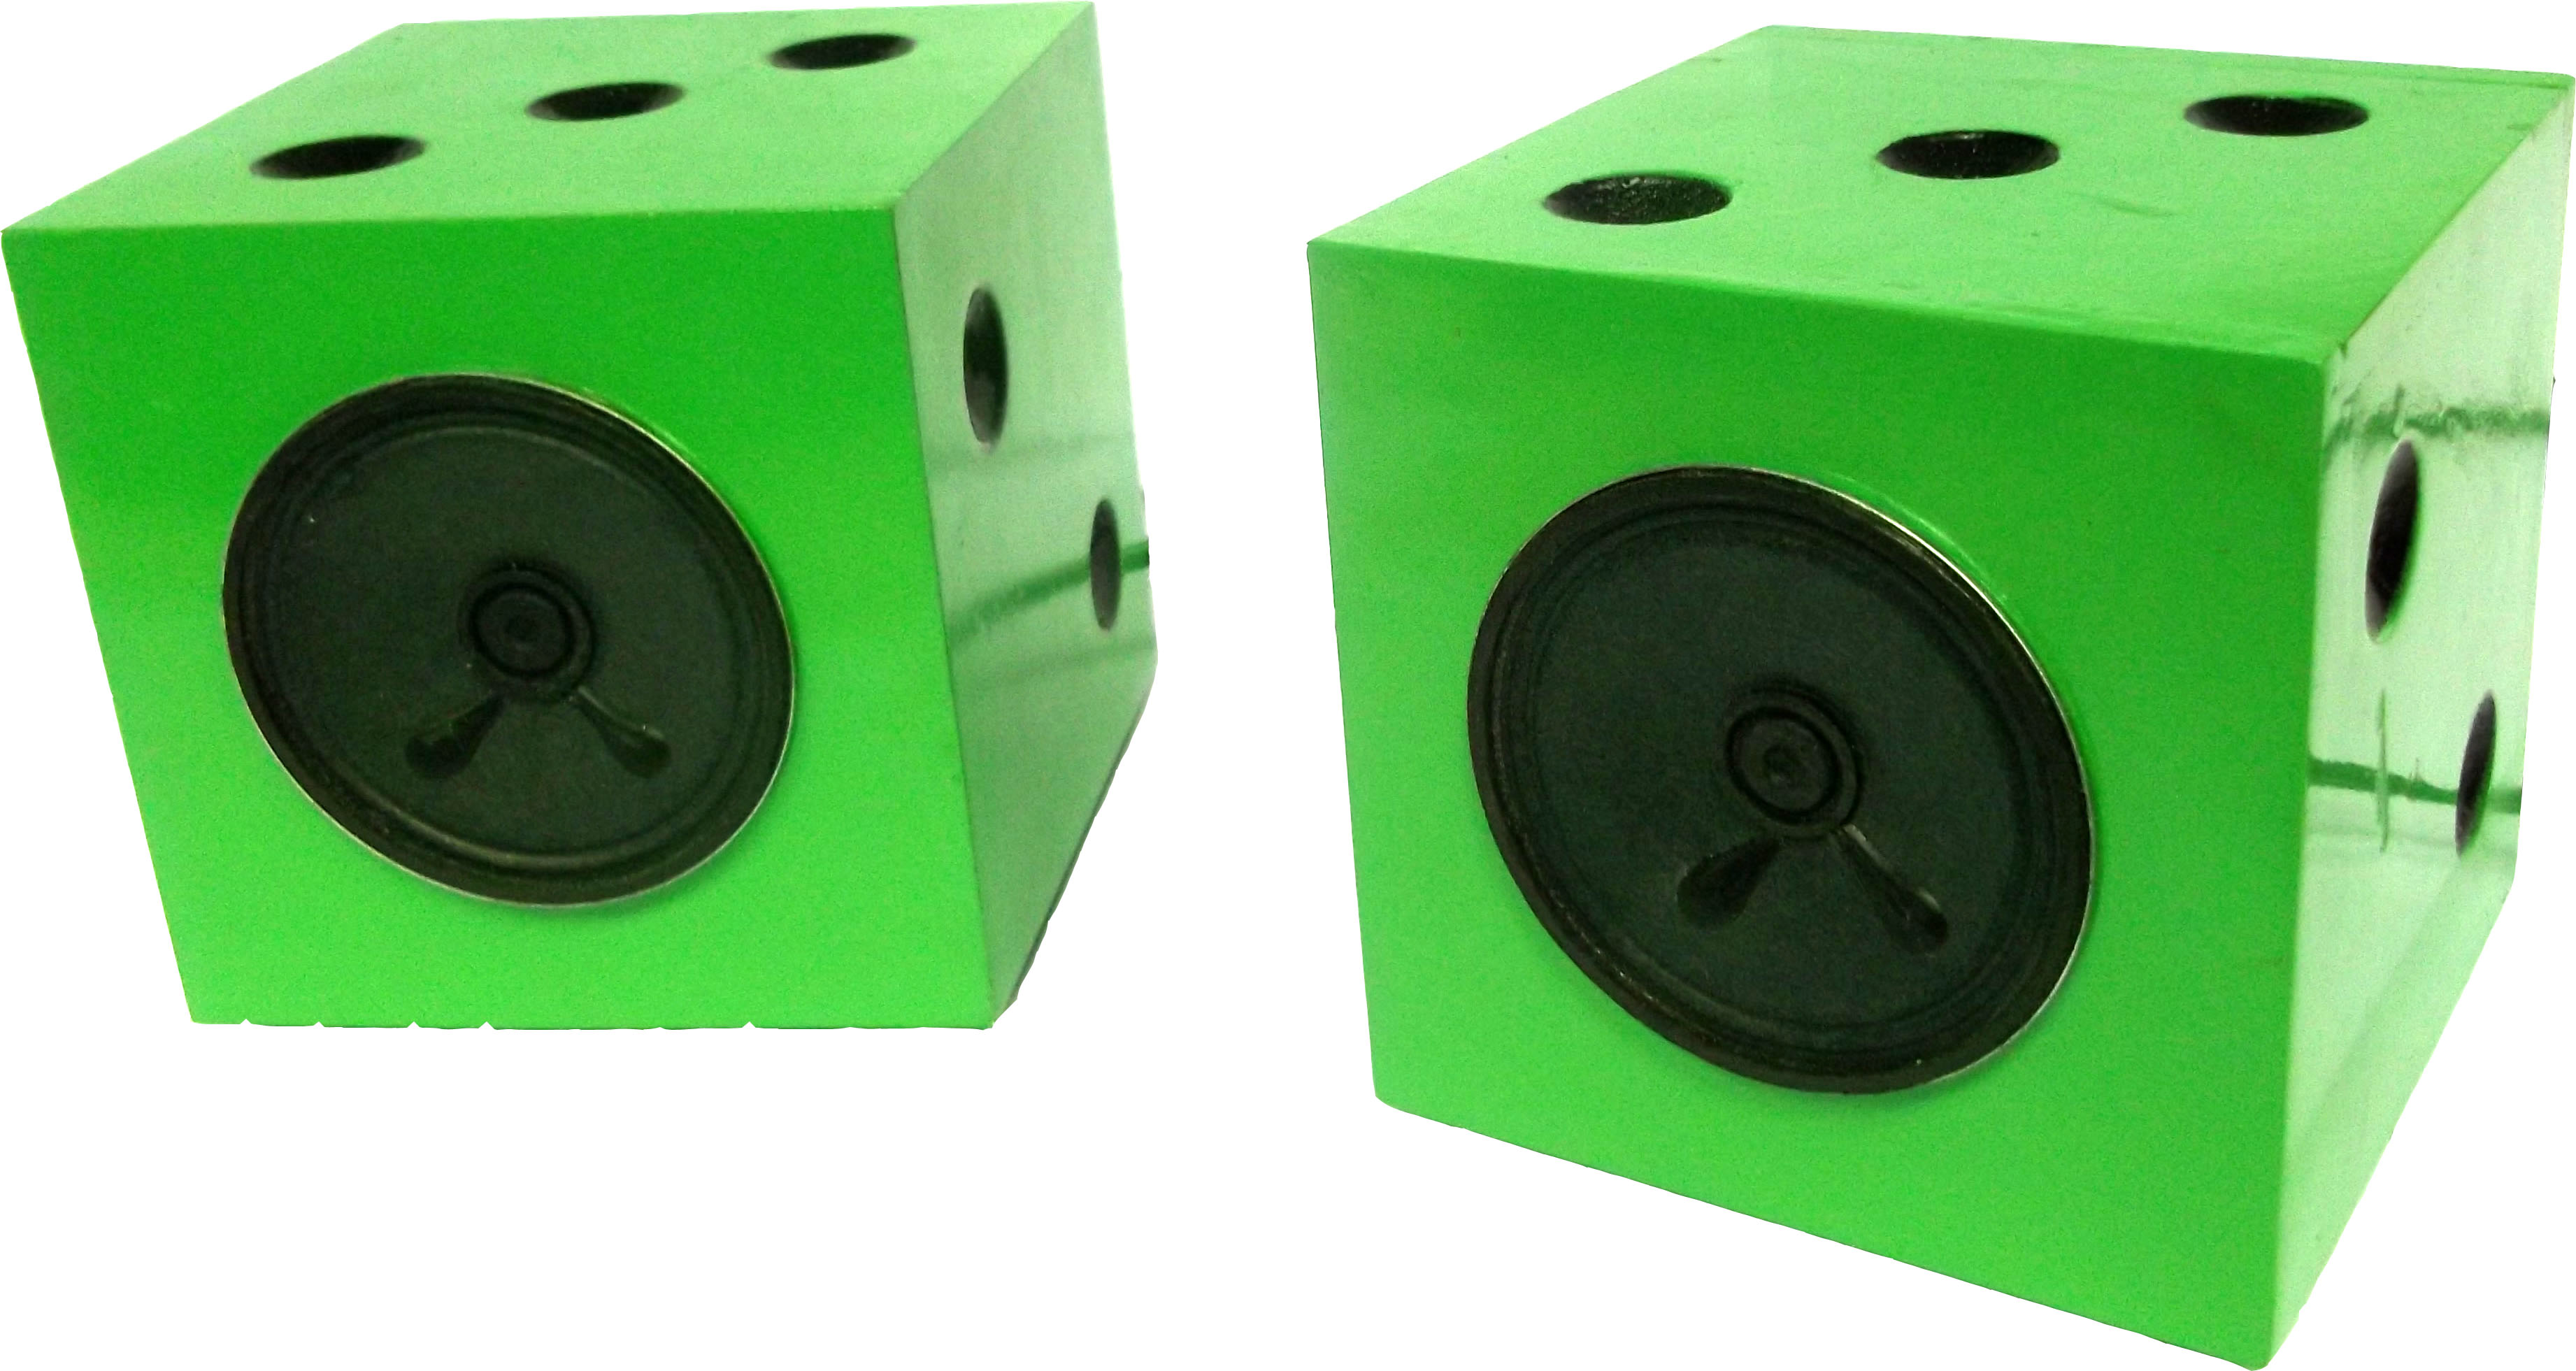 17 cool speakers designs - photo #26